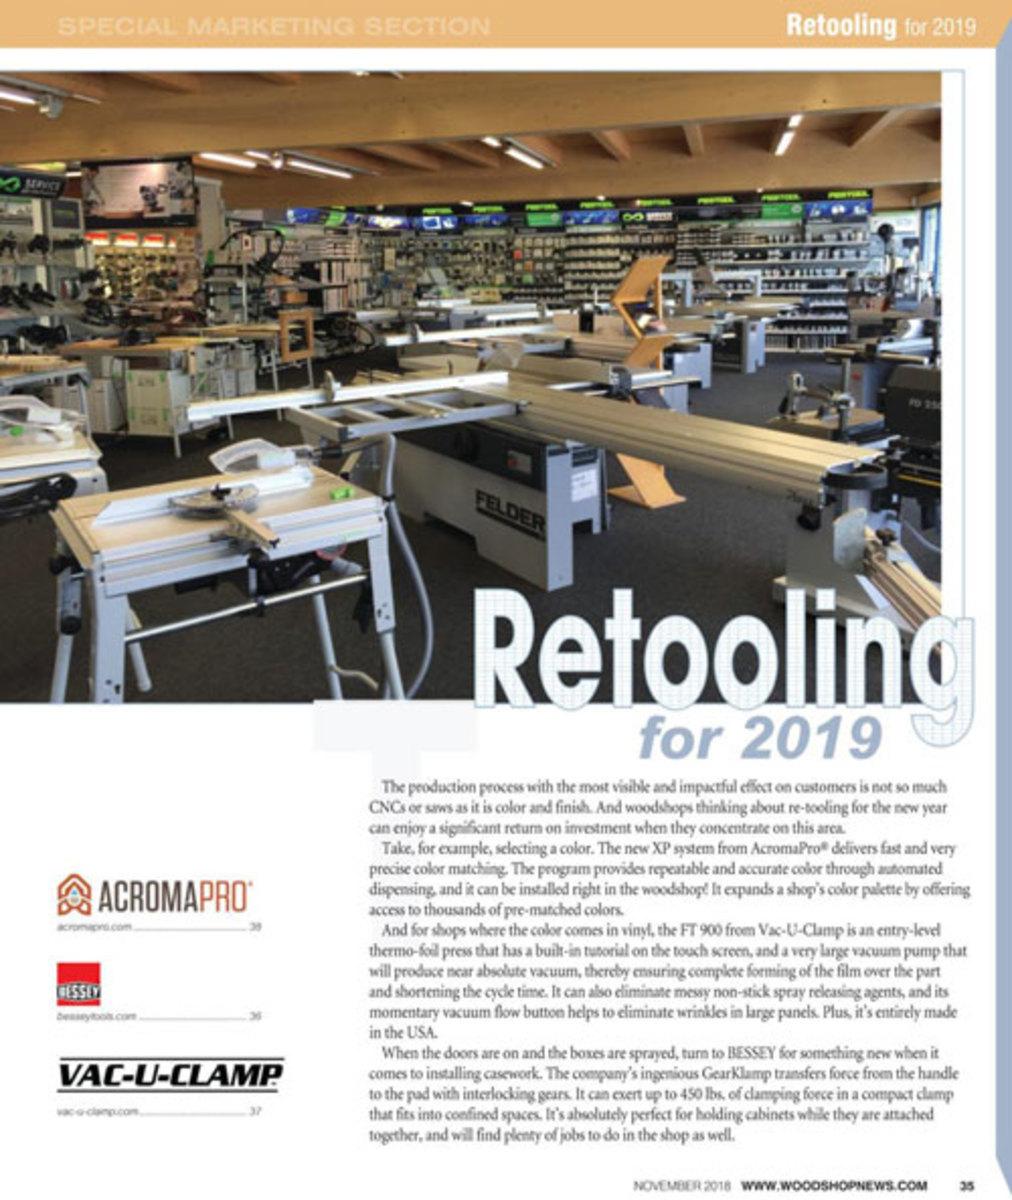 Wood-Shop-News-Retooling-for-2019x500